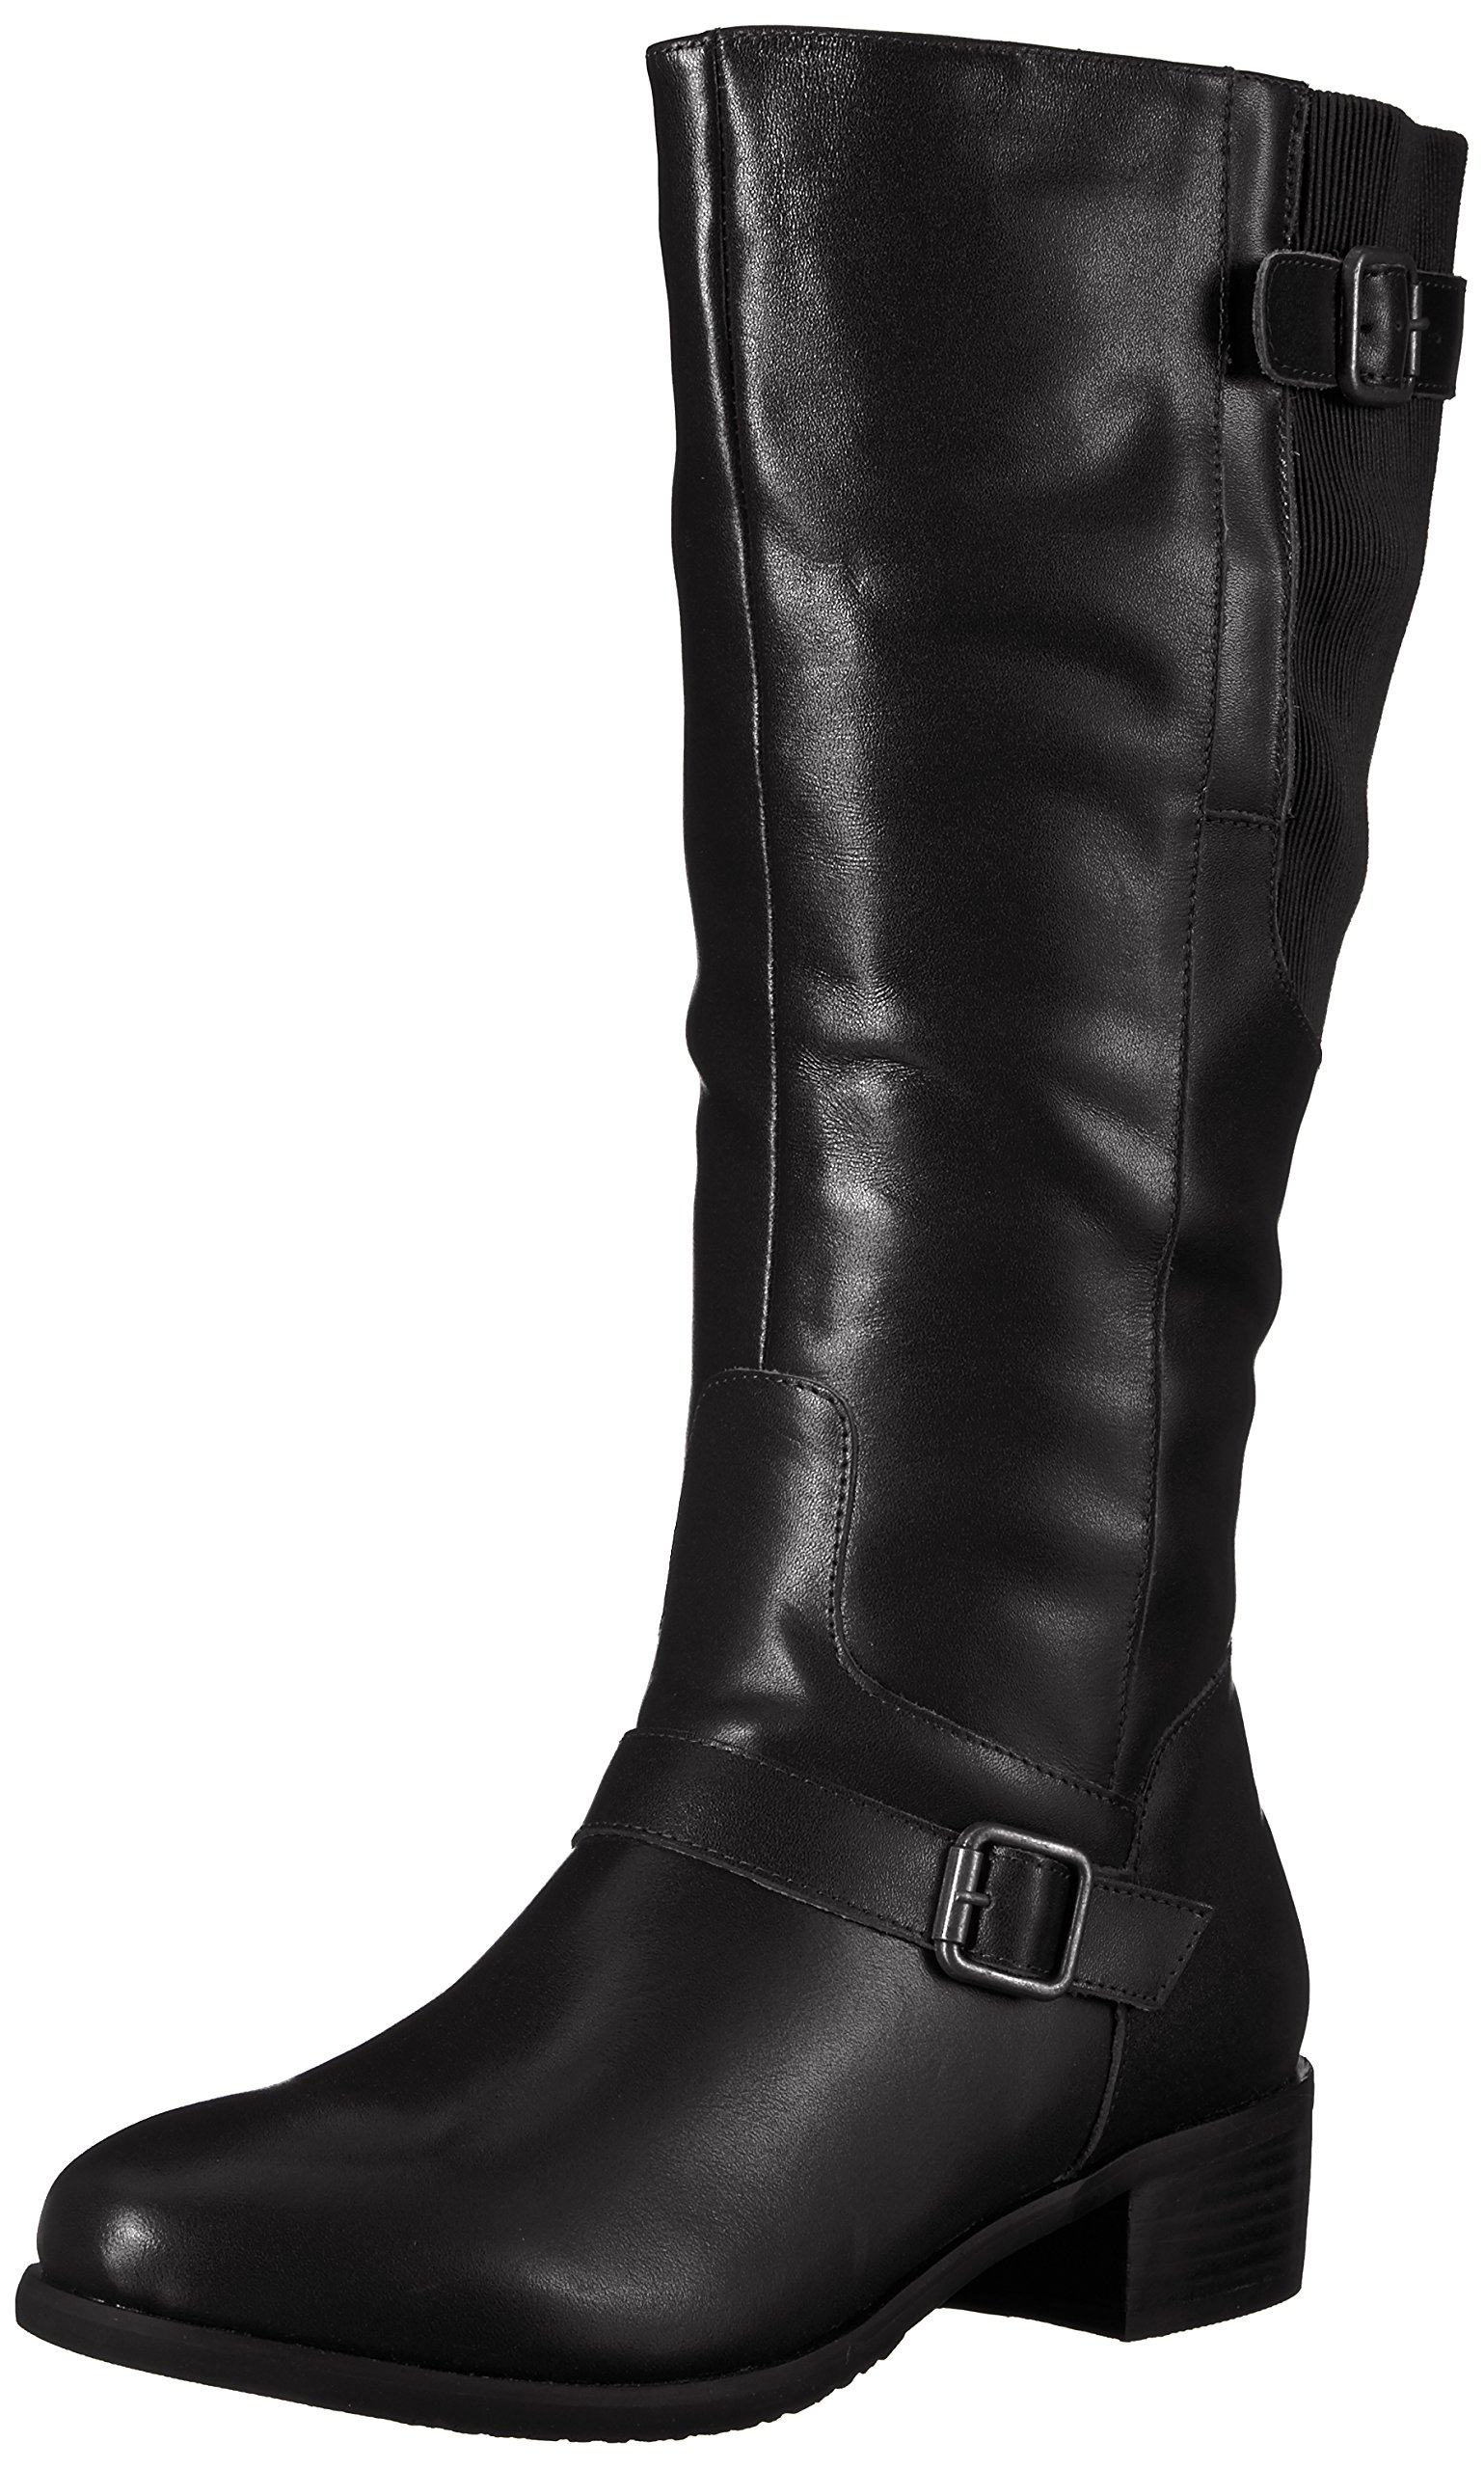 Propet Women's Teagan Riding Boot, Black, 11 M US